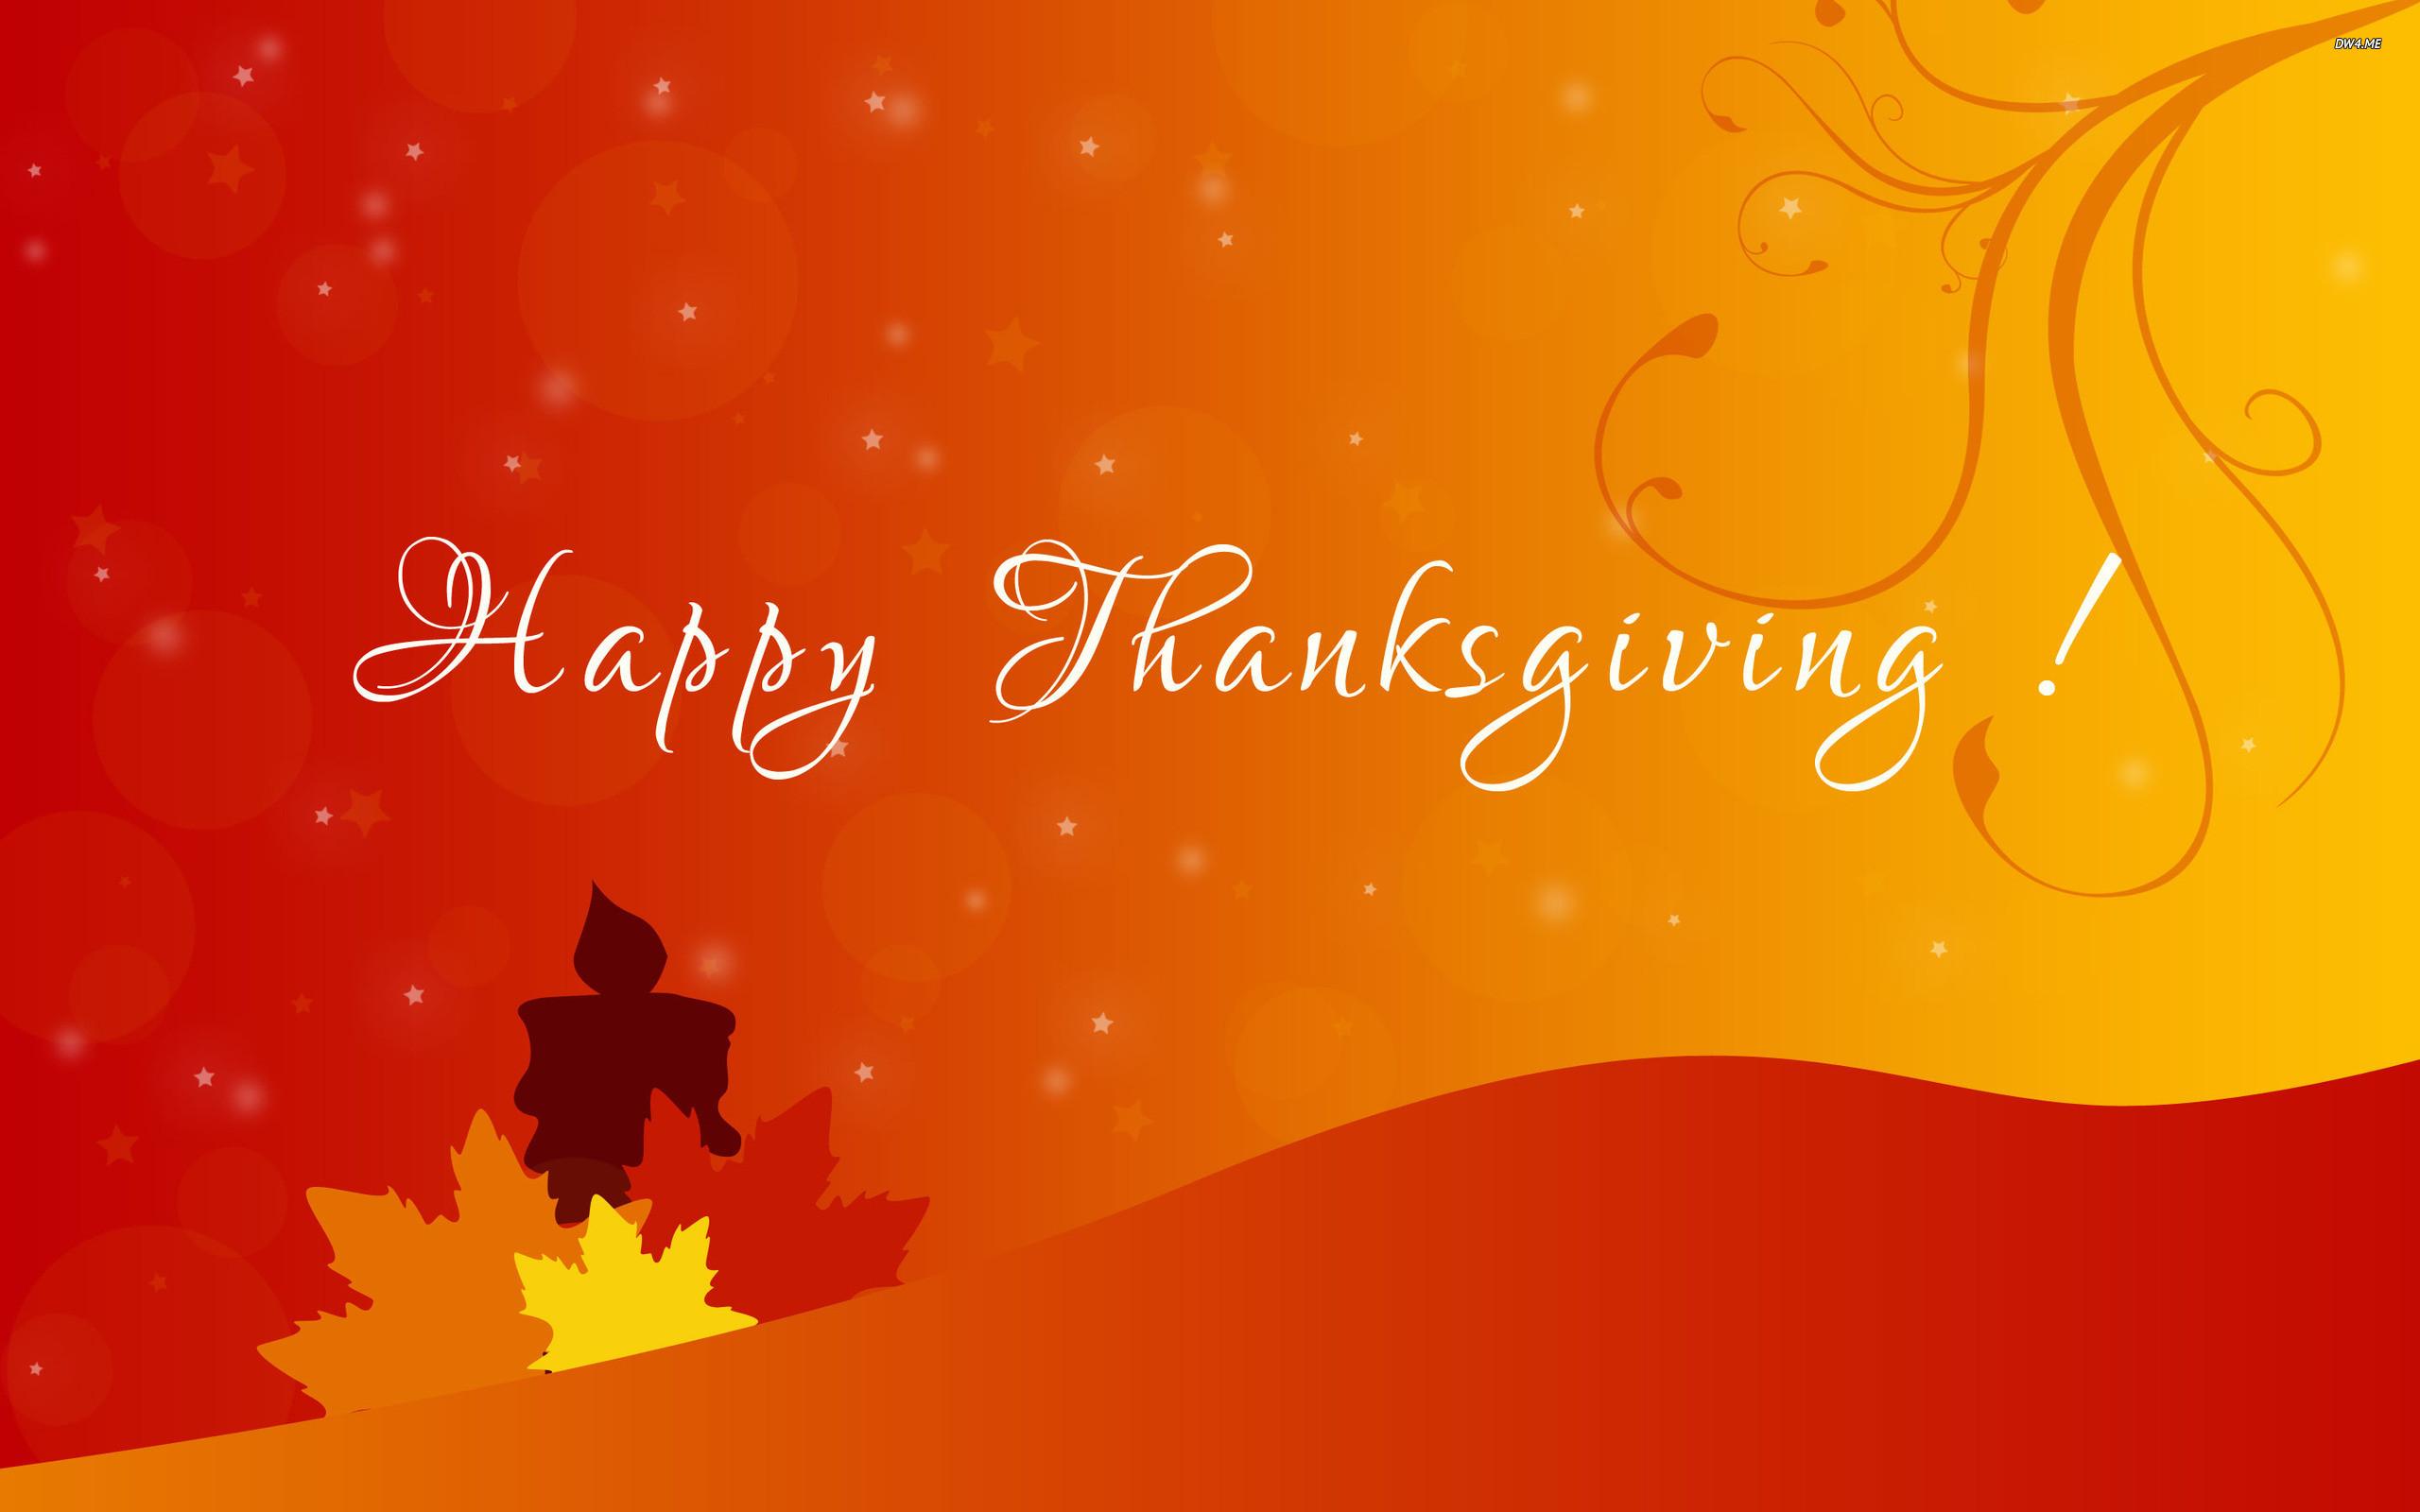 thanksgiving wallpapers desktop. Â«Â«